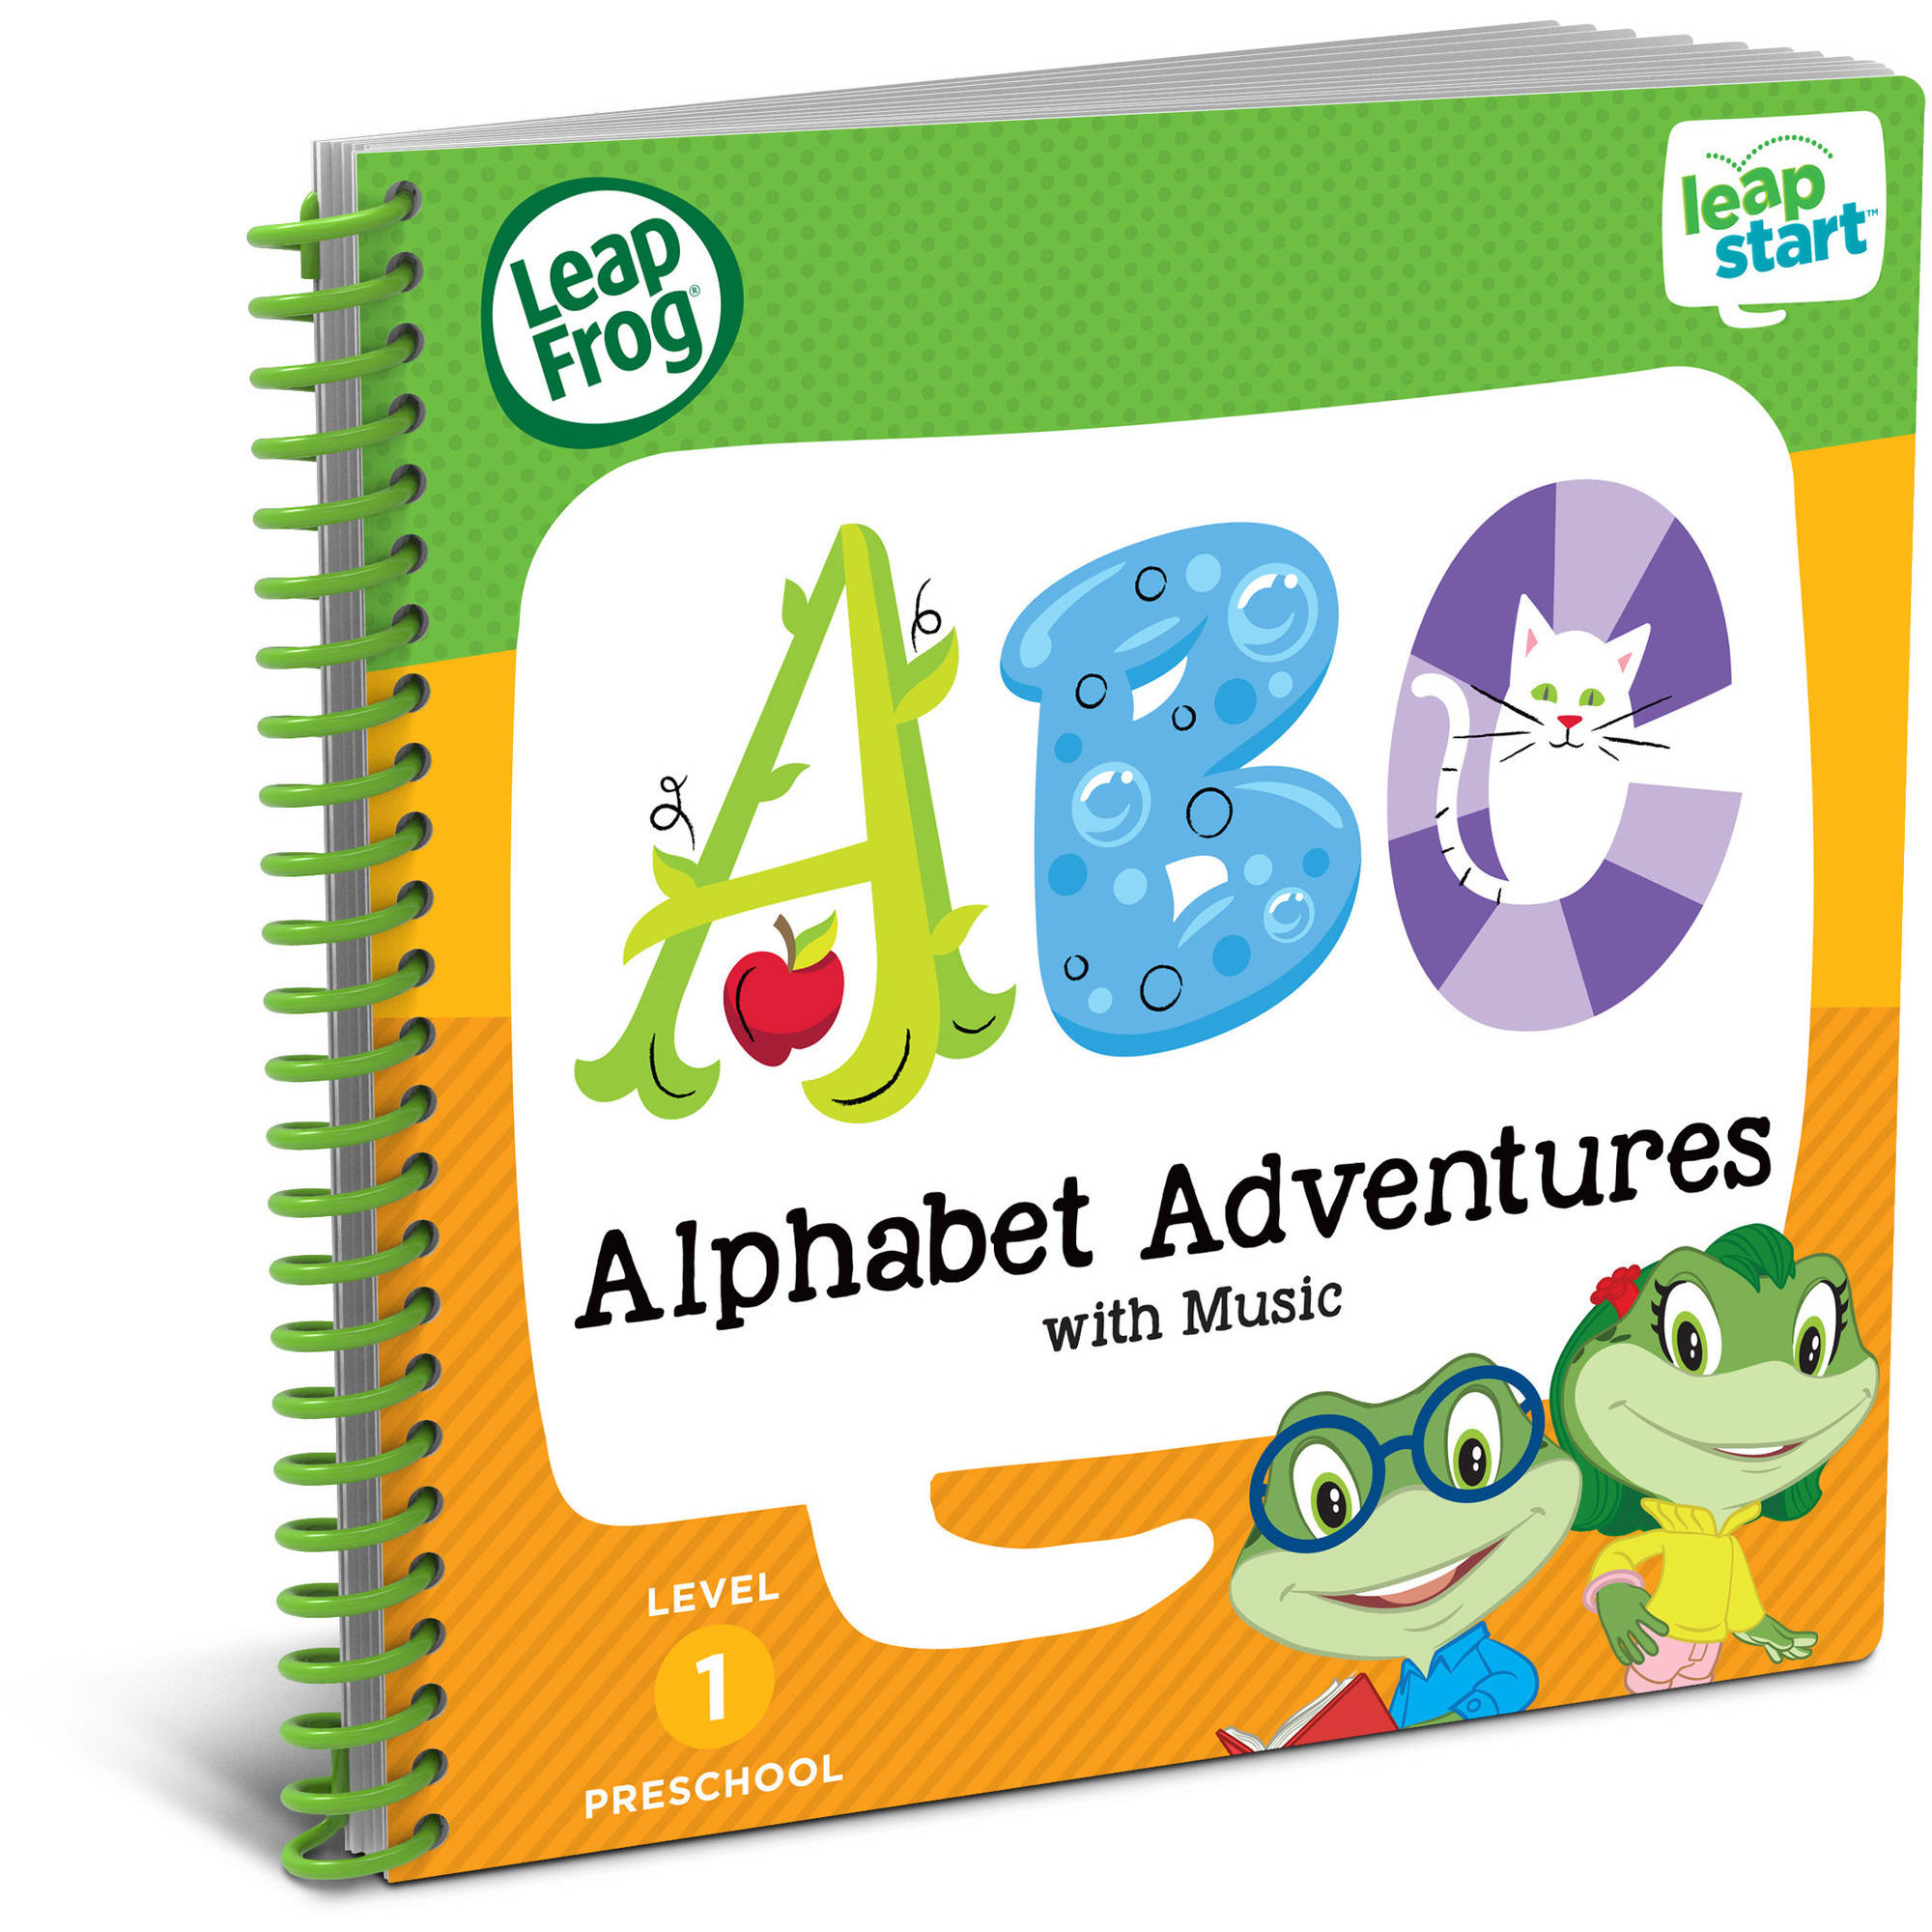 LeapFrog LeapStart Preschool Activity Book: Alphabet Adventures and Music by Generic